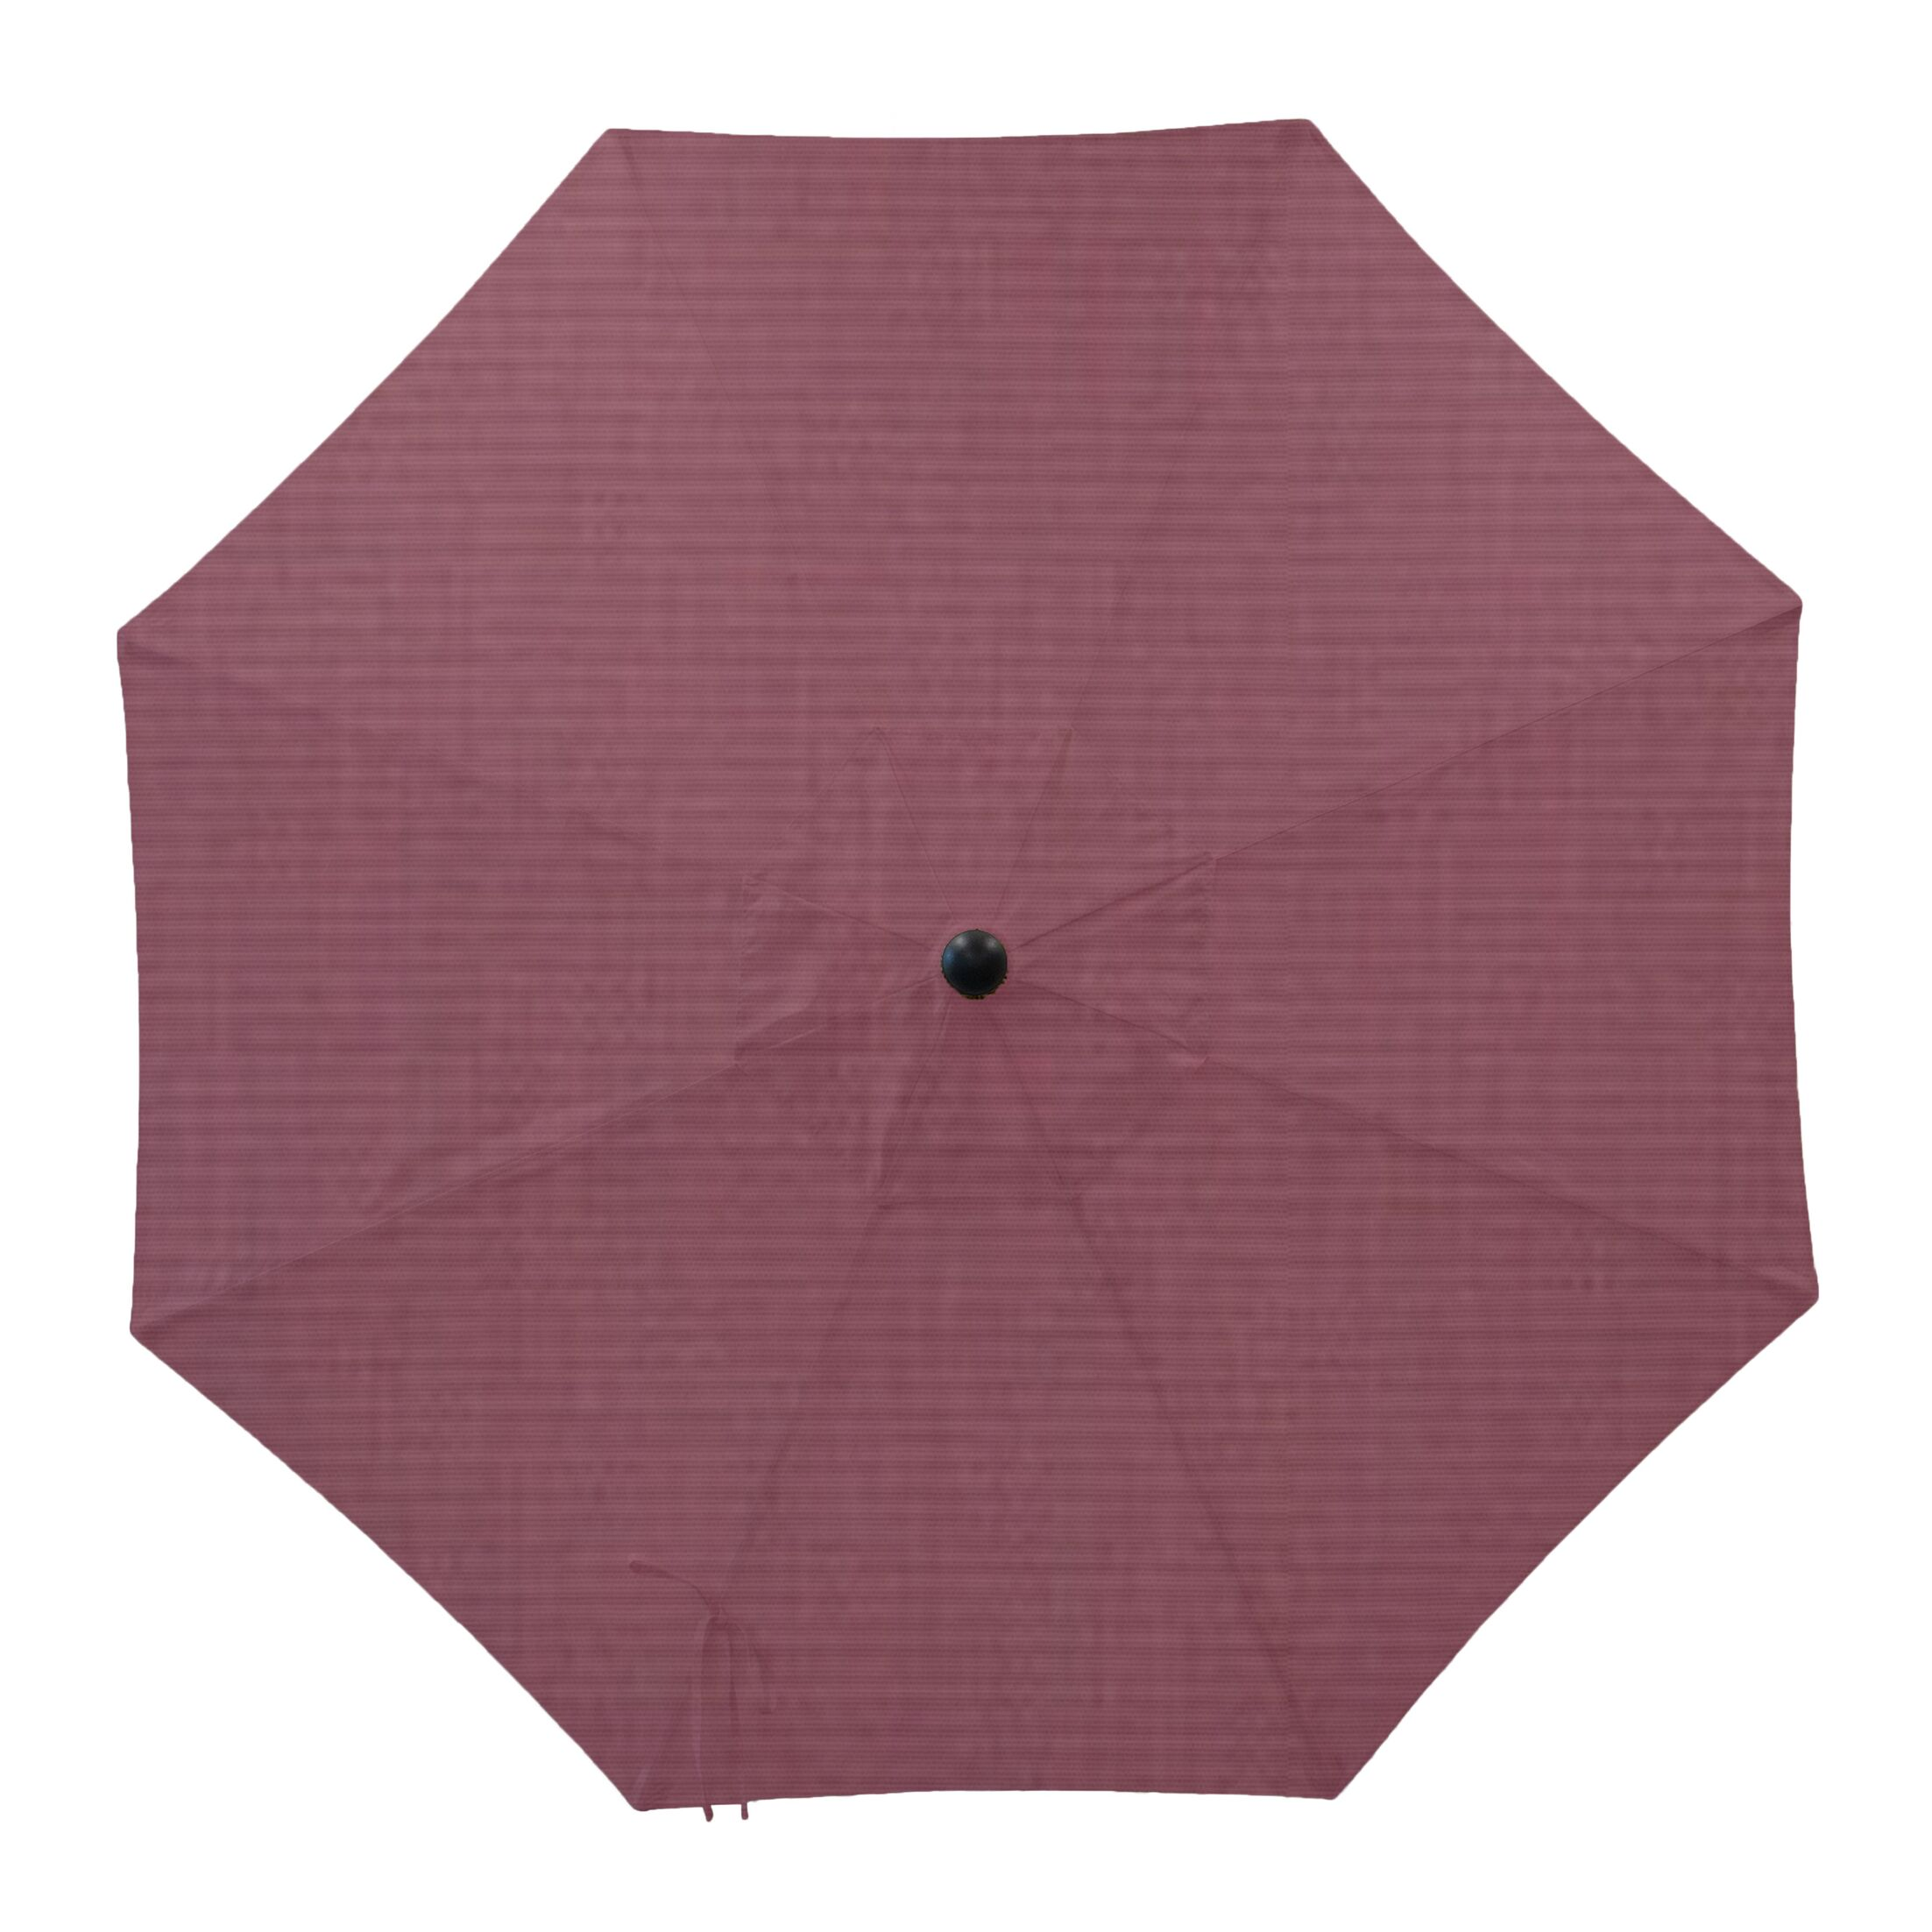 Patio Umbrella Covers Color: Iris